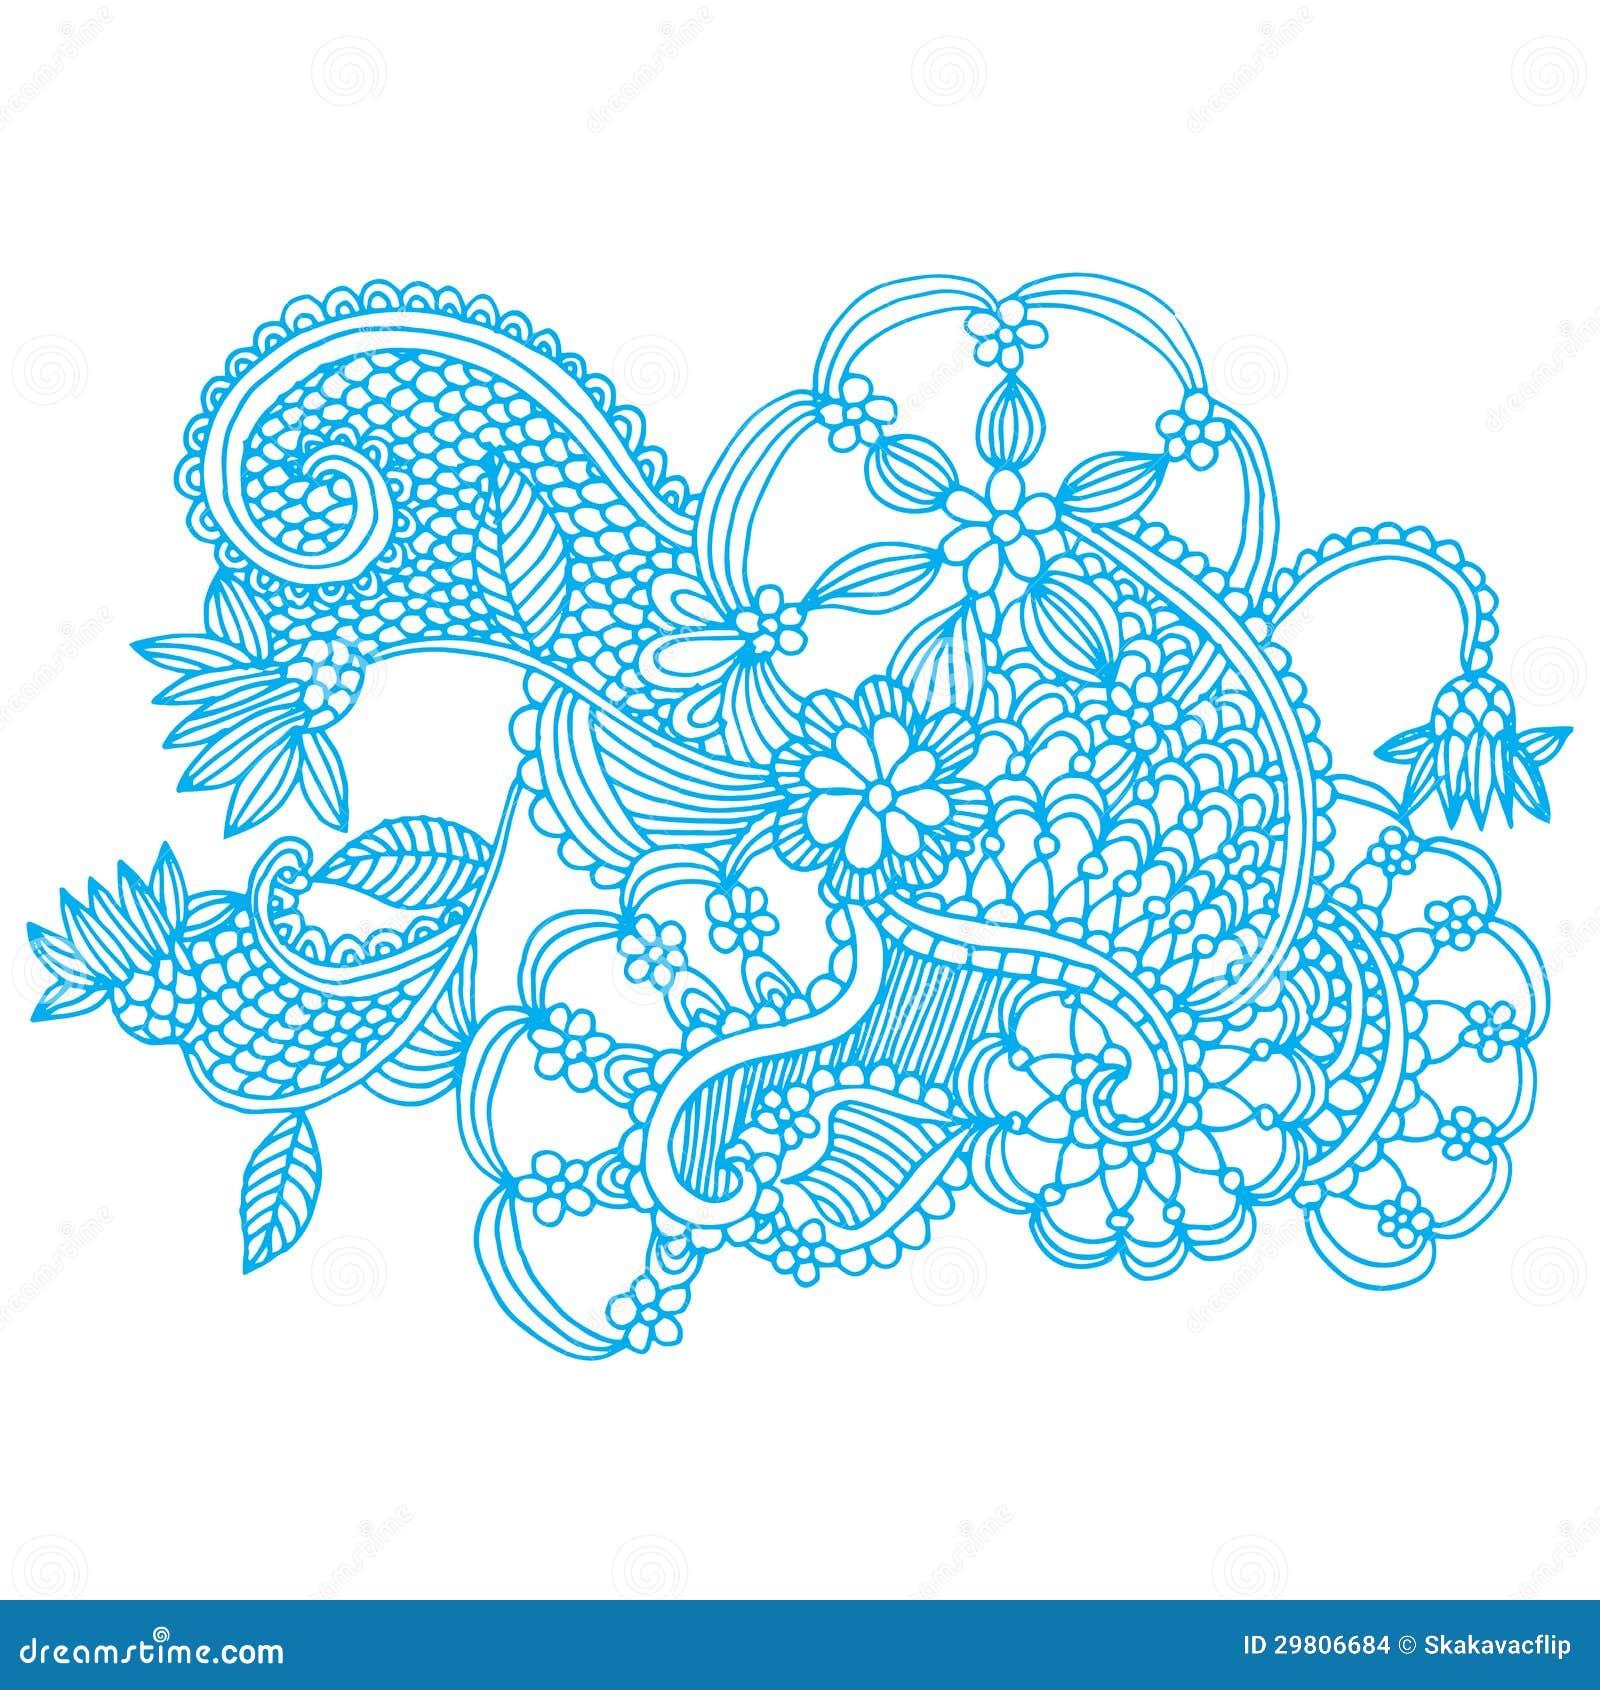 Neckline embroidery design stock illustration